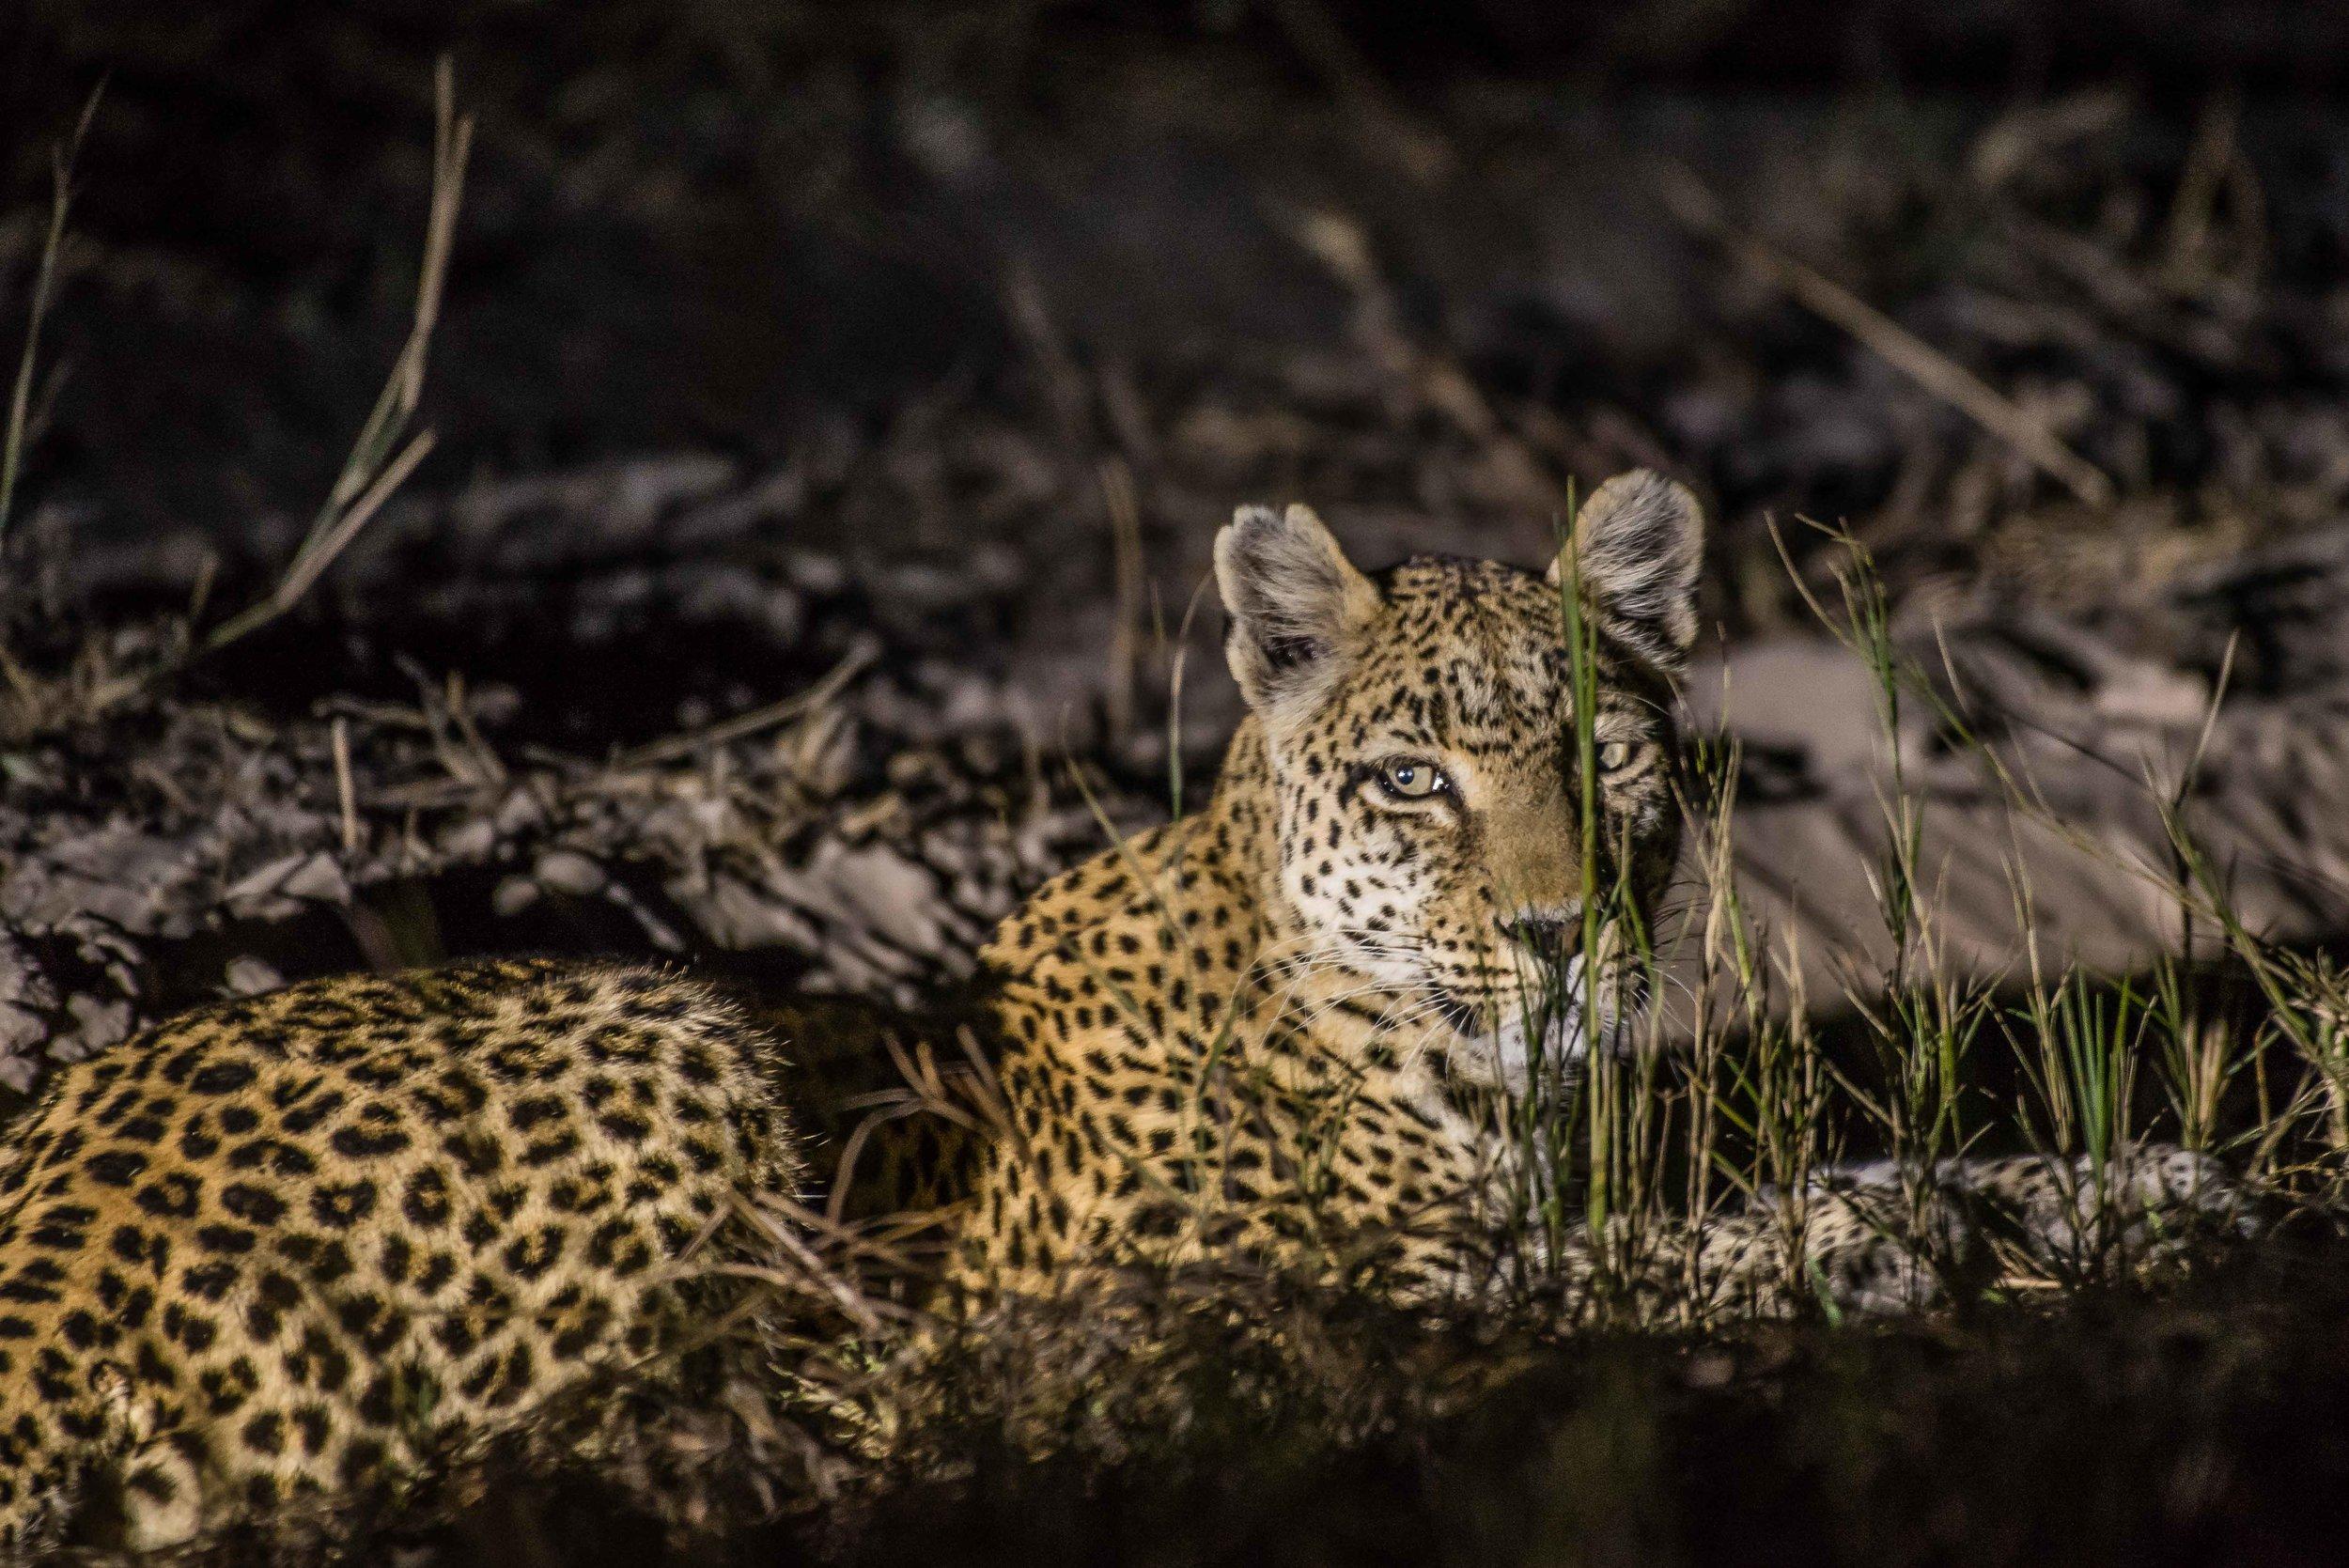 Erin-Fabio-Photography-Africa-2018-22.jpg